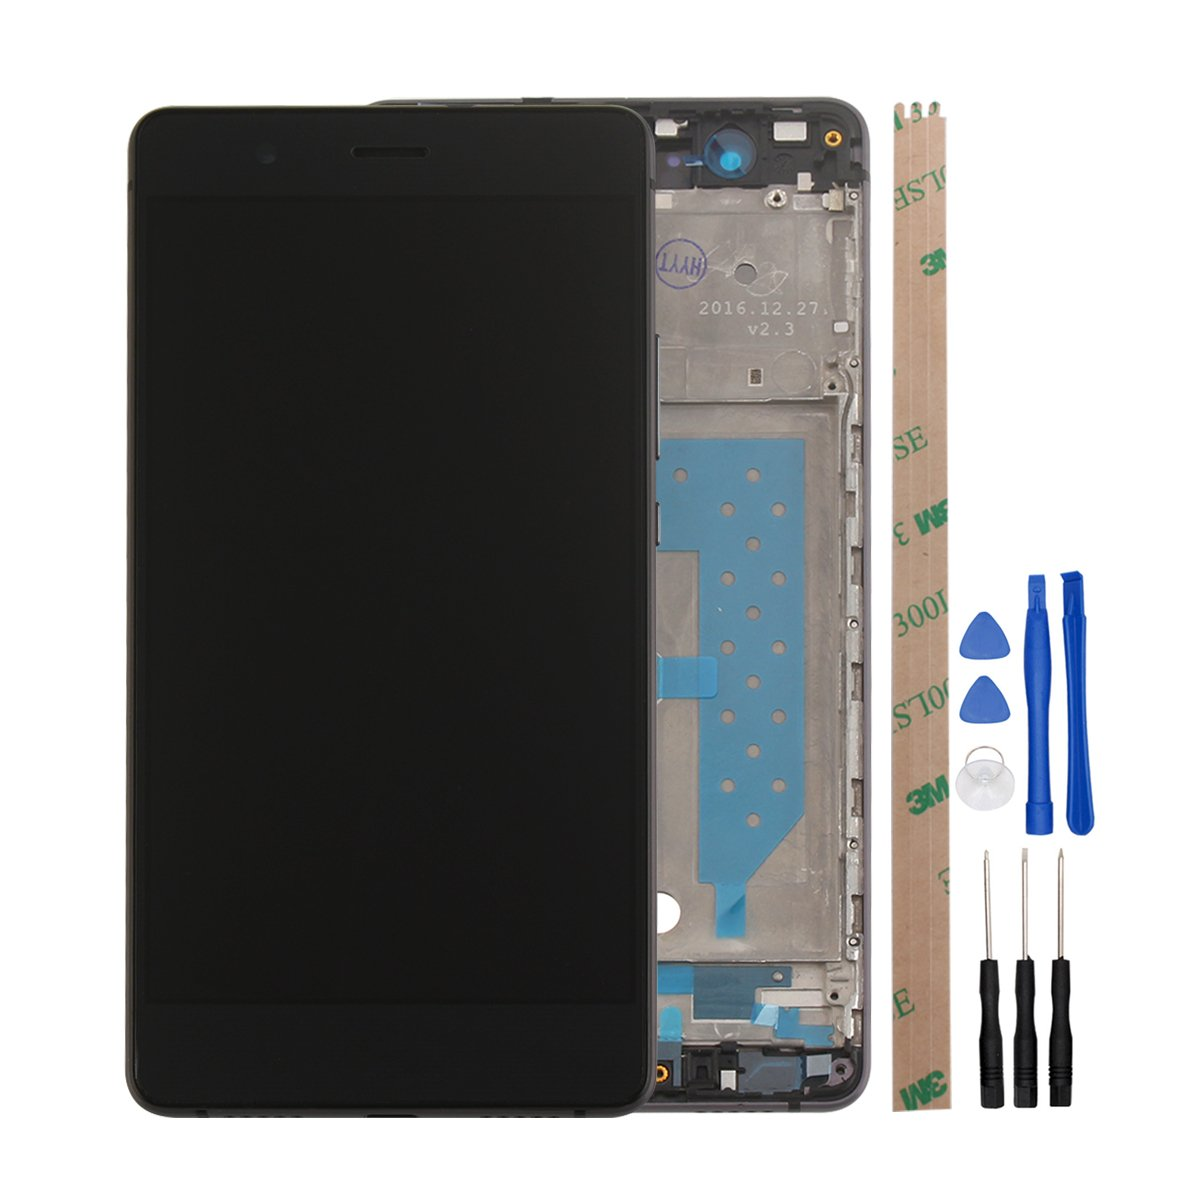 HYYT LCD Display+Touchscreen Digitizer+Rahmen für: Amazon.de: Elektronik